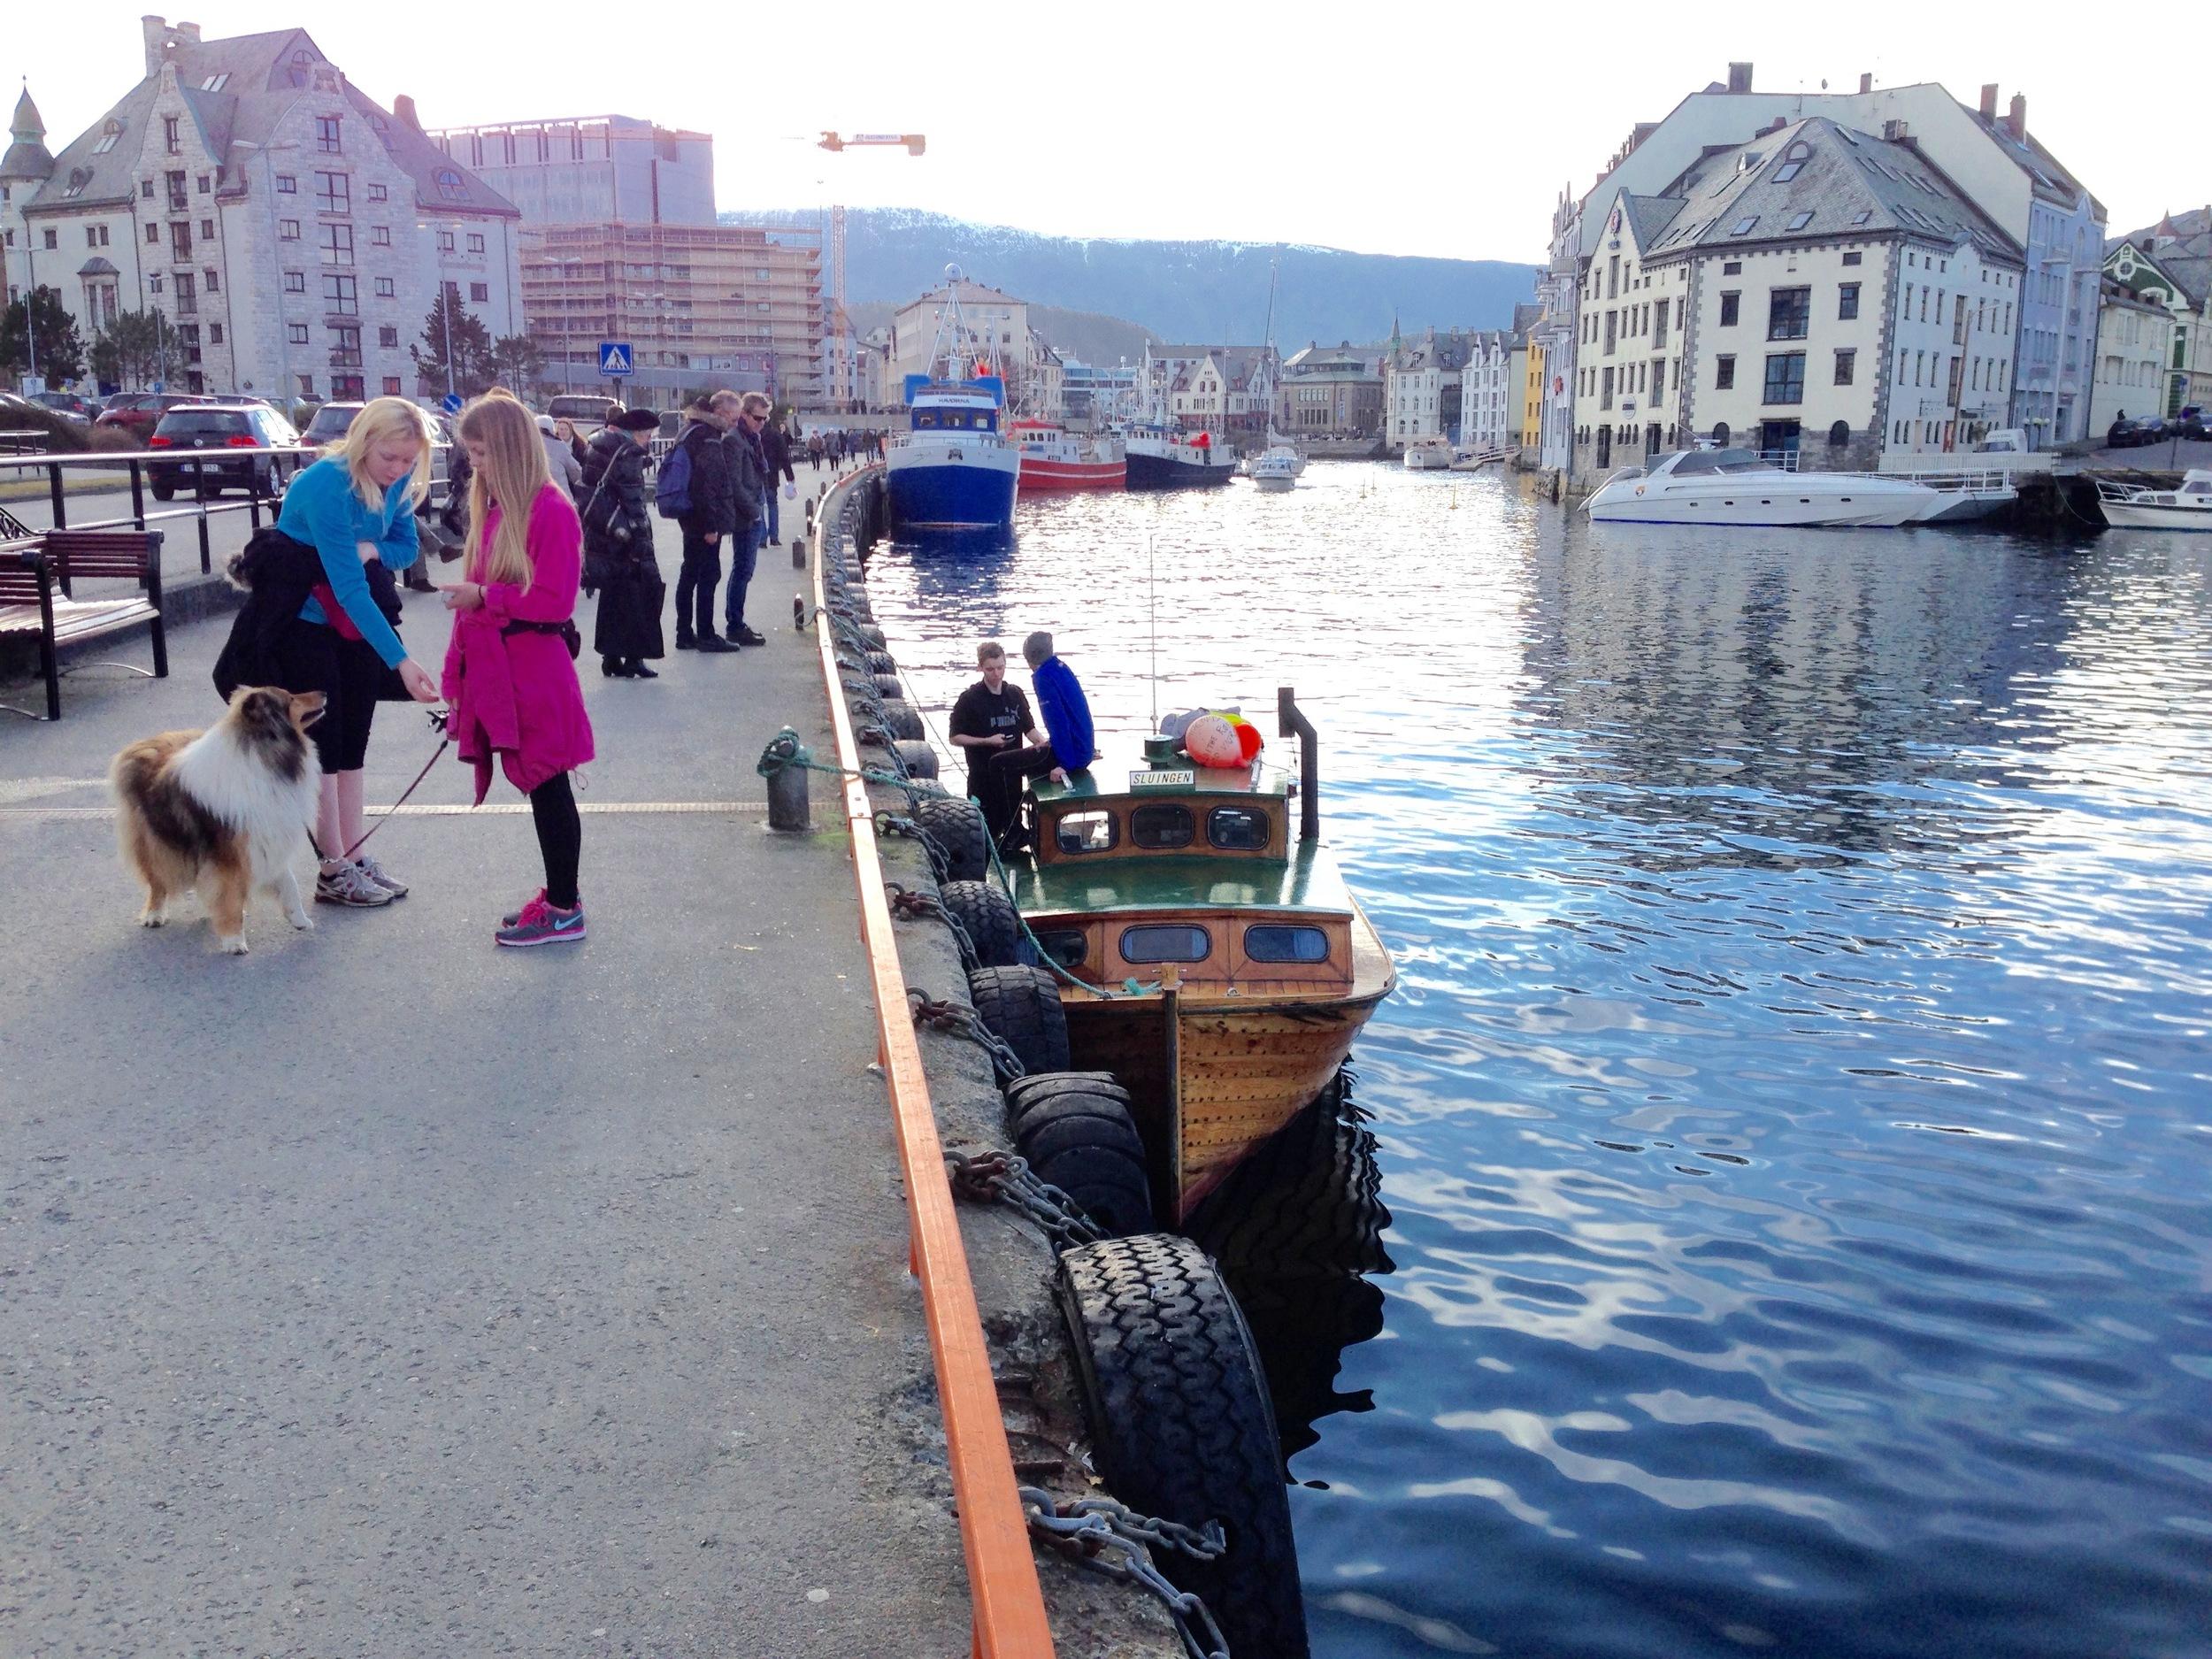 Det gode liv på havna i Ålesund. Hvordan - og hvem skal markedsføre byen fremover?    Foto: Odd Roar Lange